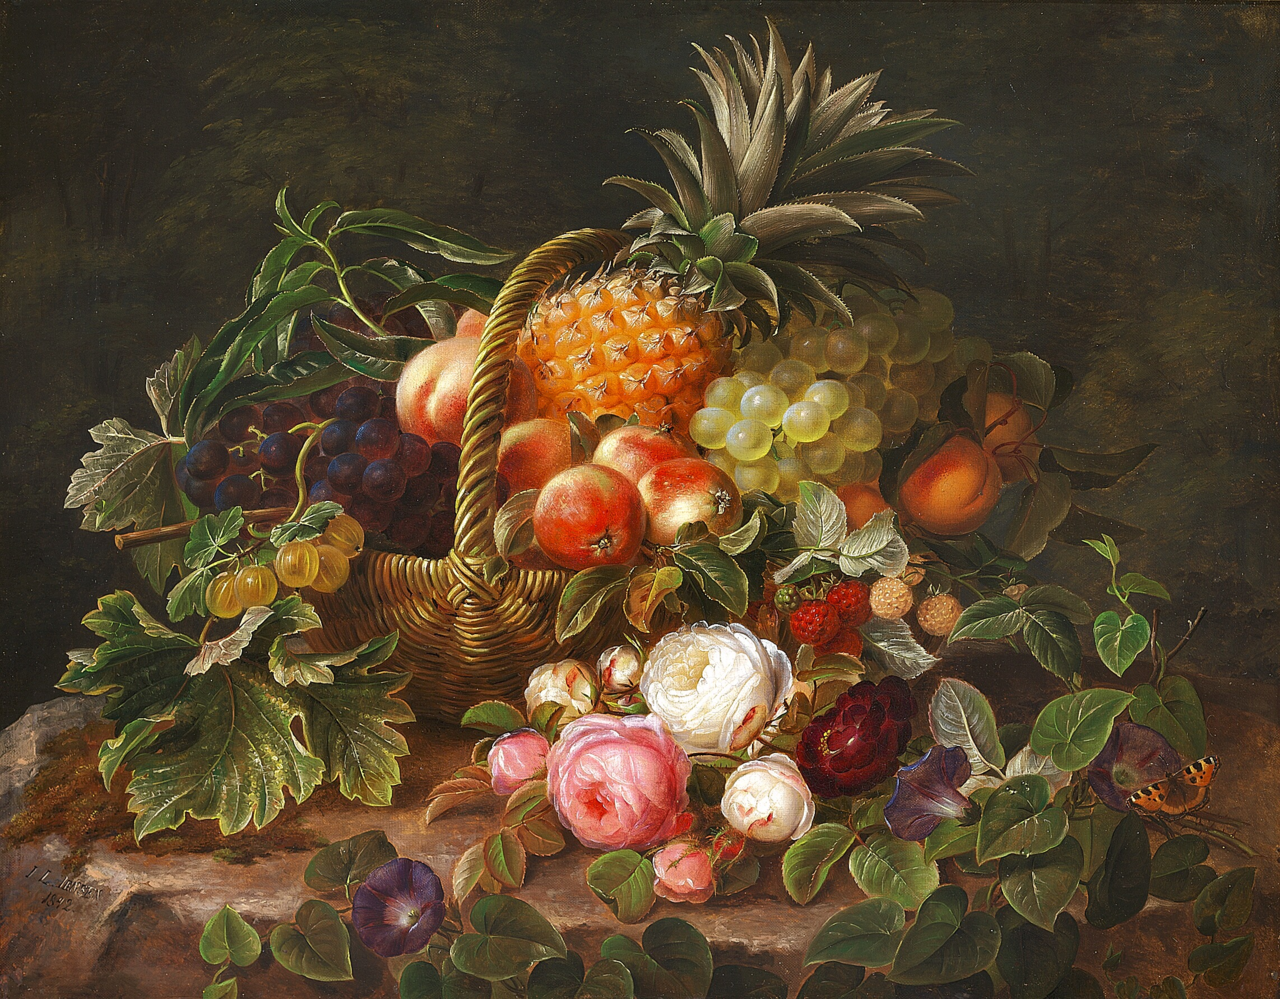 Johan Laurentz Jensen - Opstilling med ananas, druer og stikkelsbær i en kurv på en træstub, hvorpå lyserøde roser - 1842.png